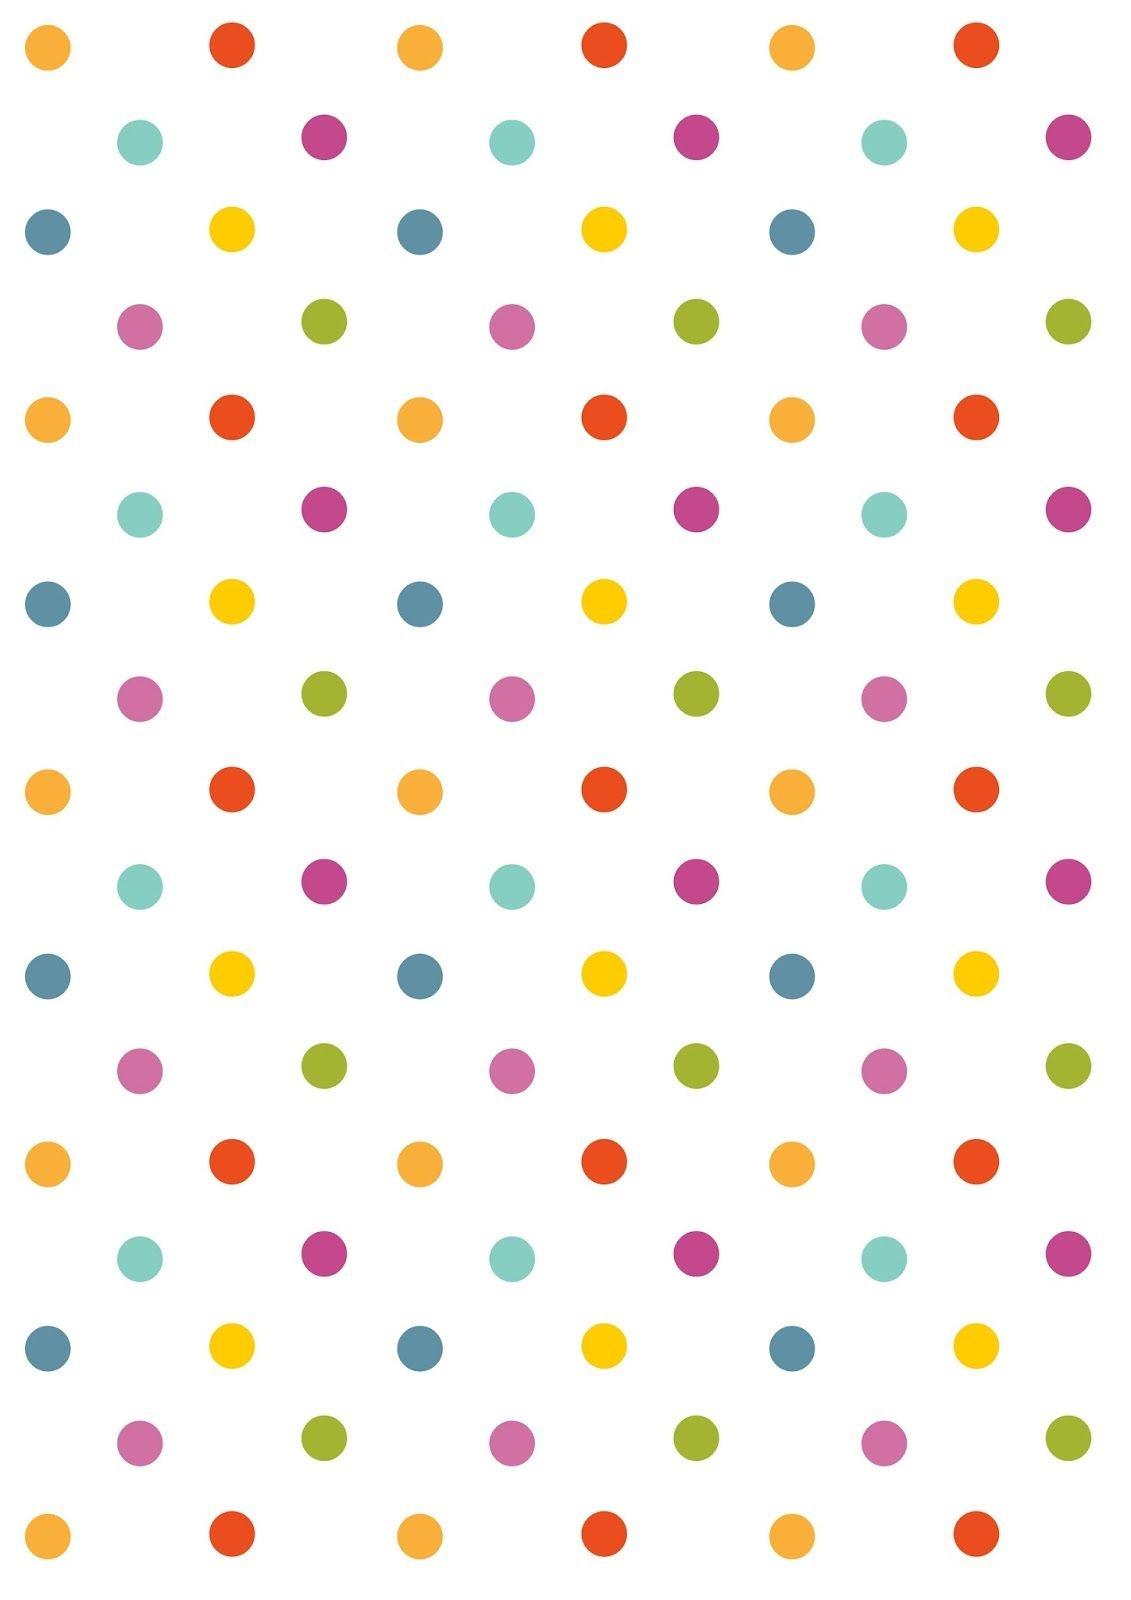 Free Digital Polka Dot Scrapbooking Paper - Ausdruckbares - Free Printable Backgrounds